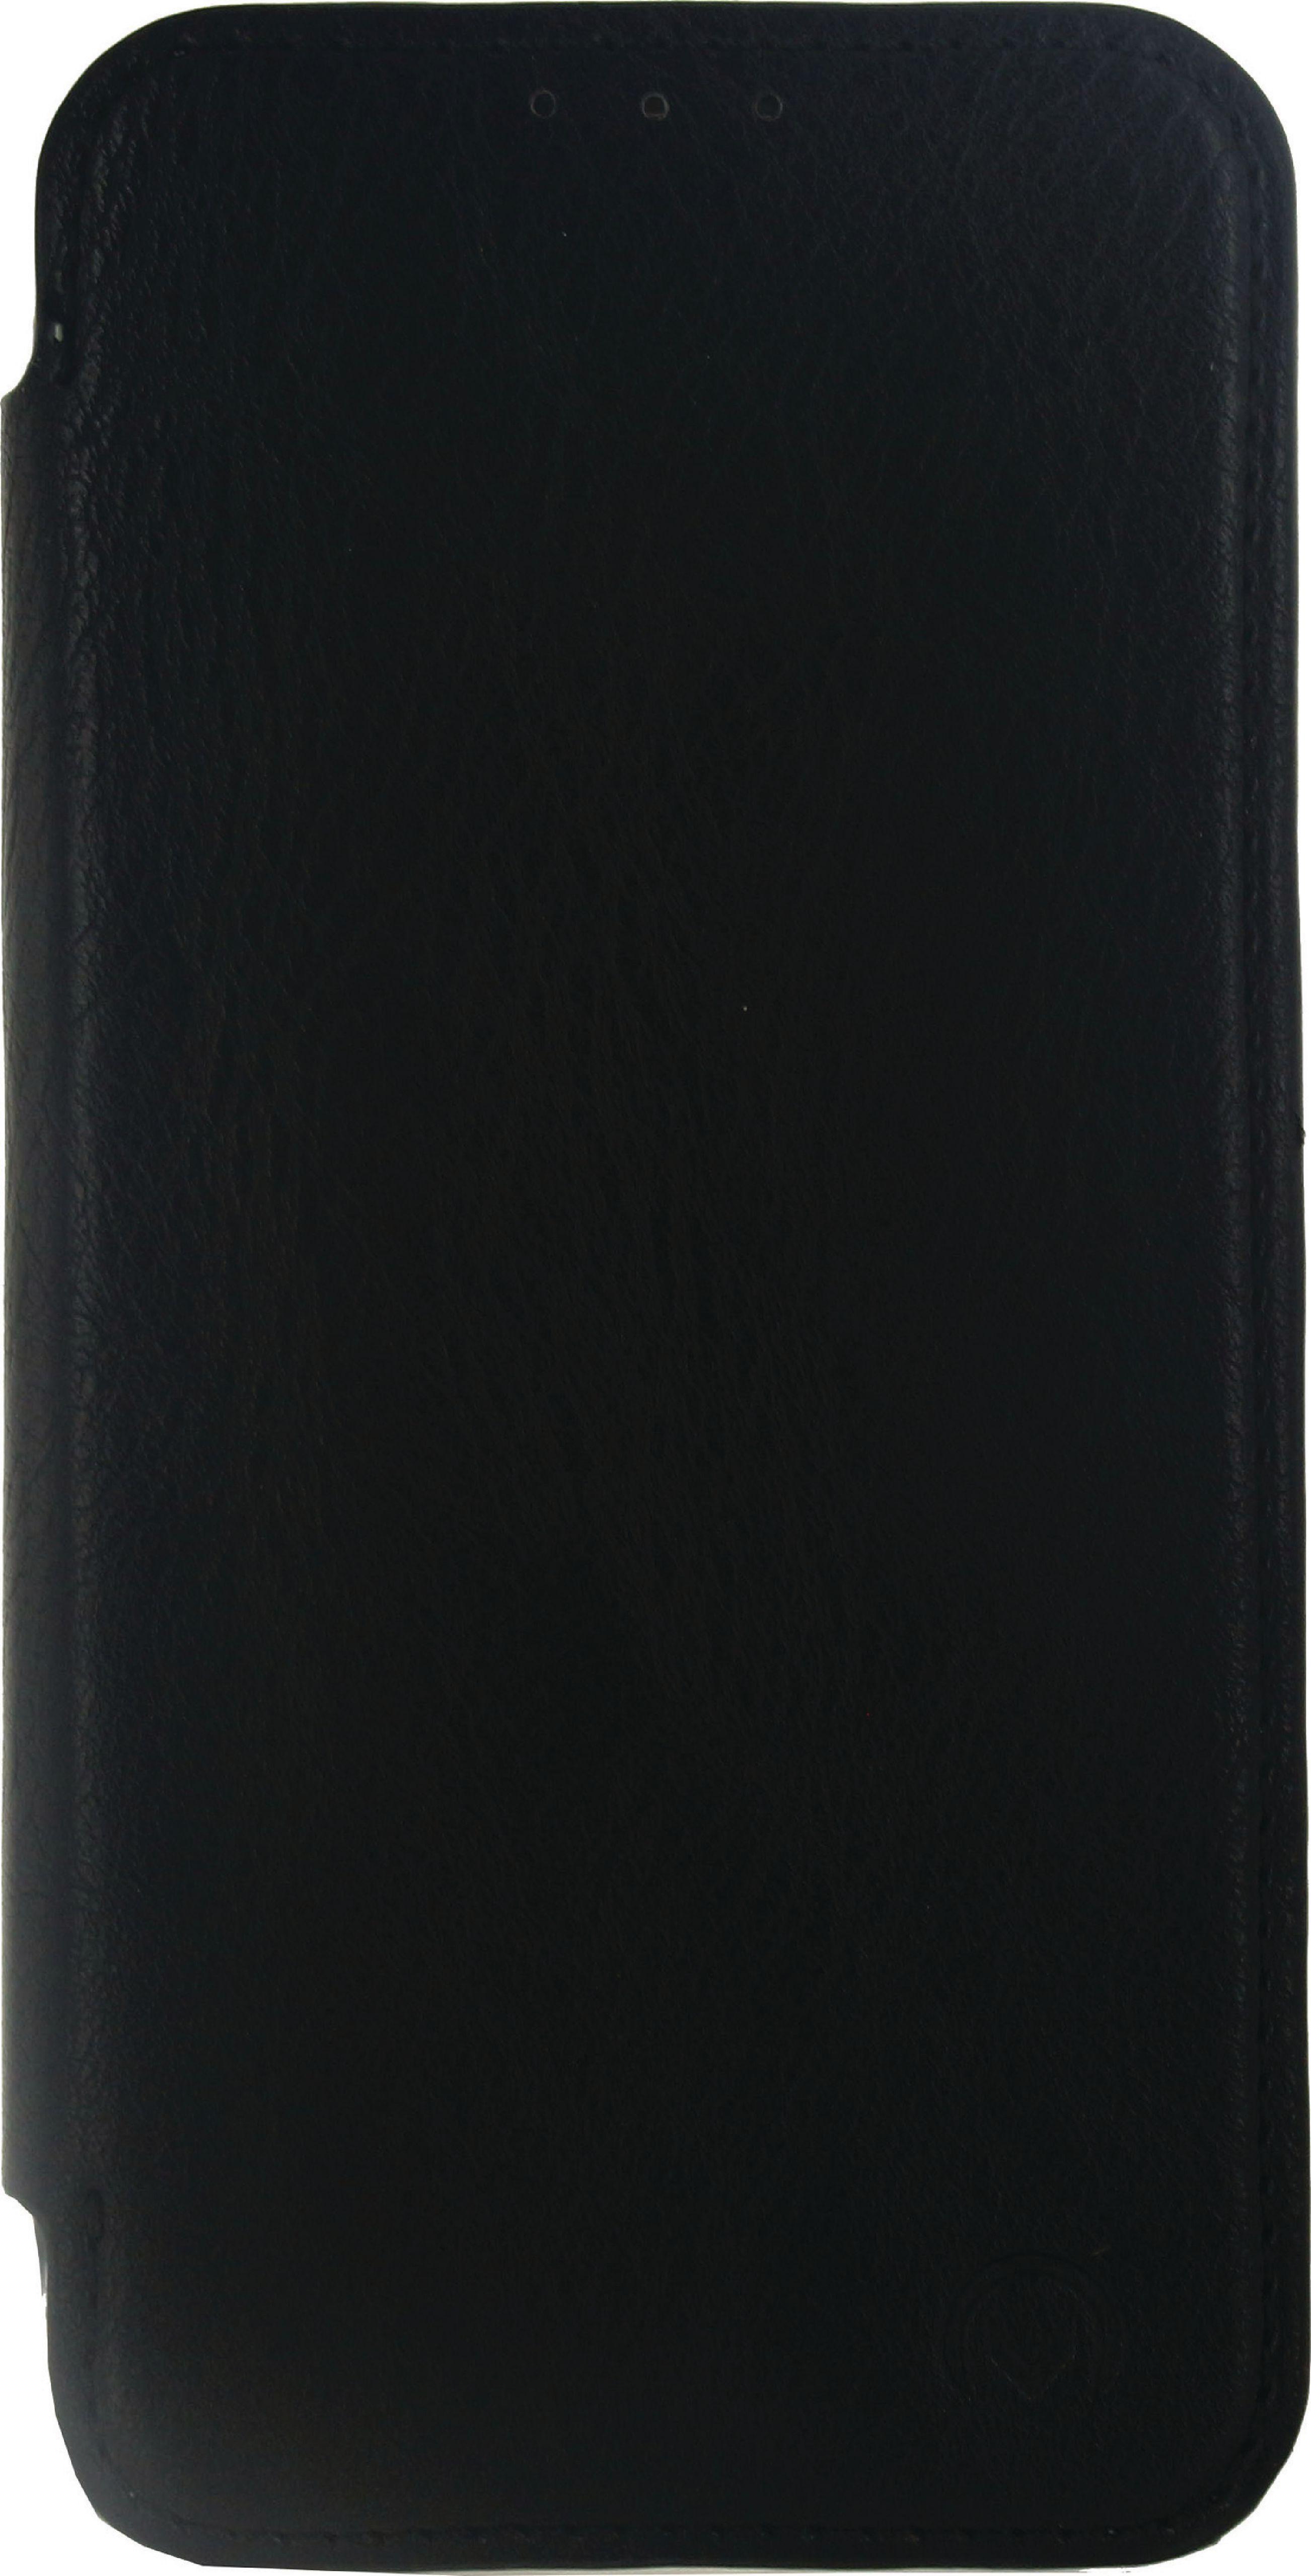 Image of   Telefon Slankt Bogetui Samsung Galaxy S7 Sort